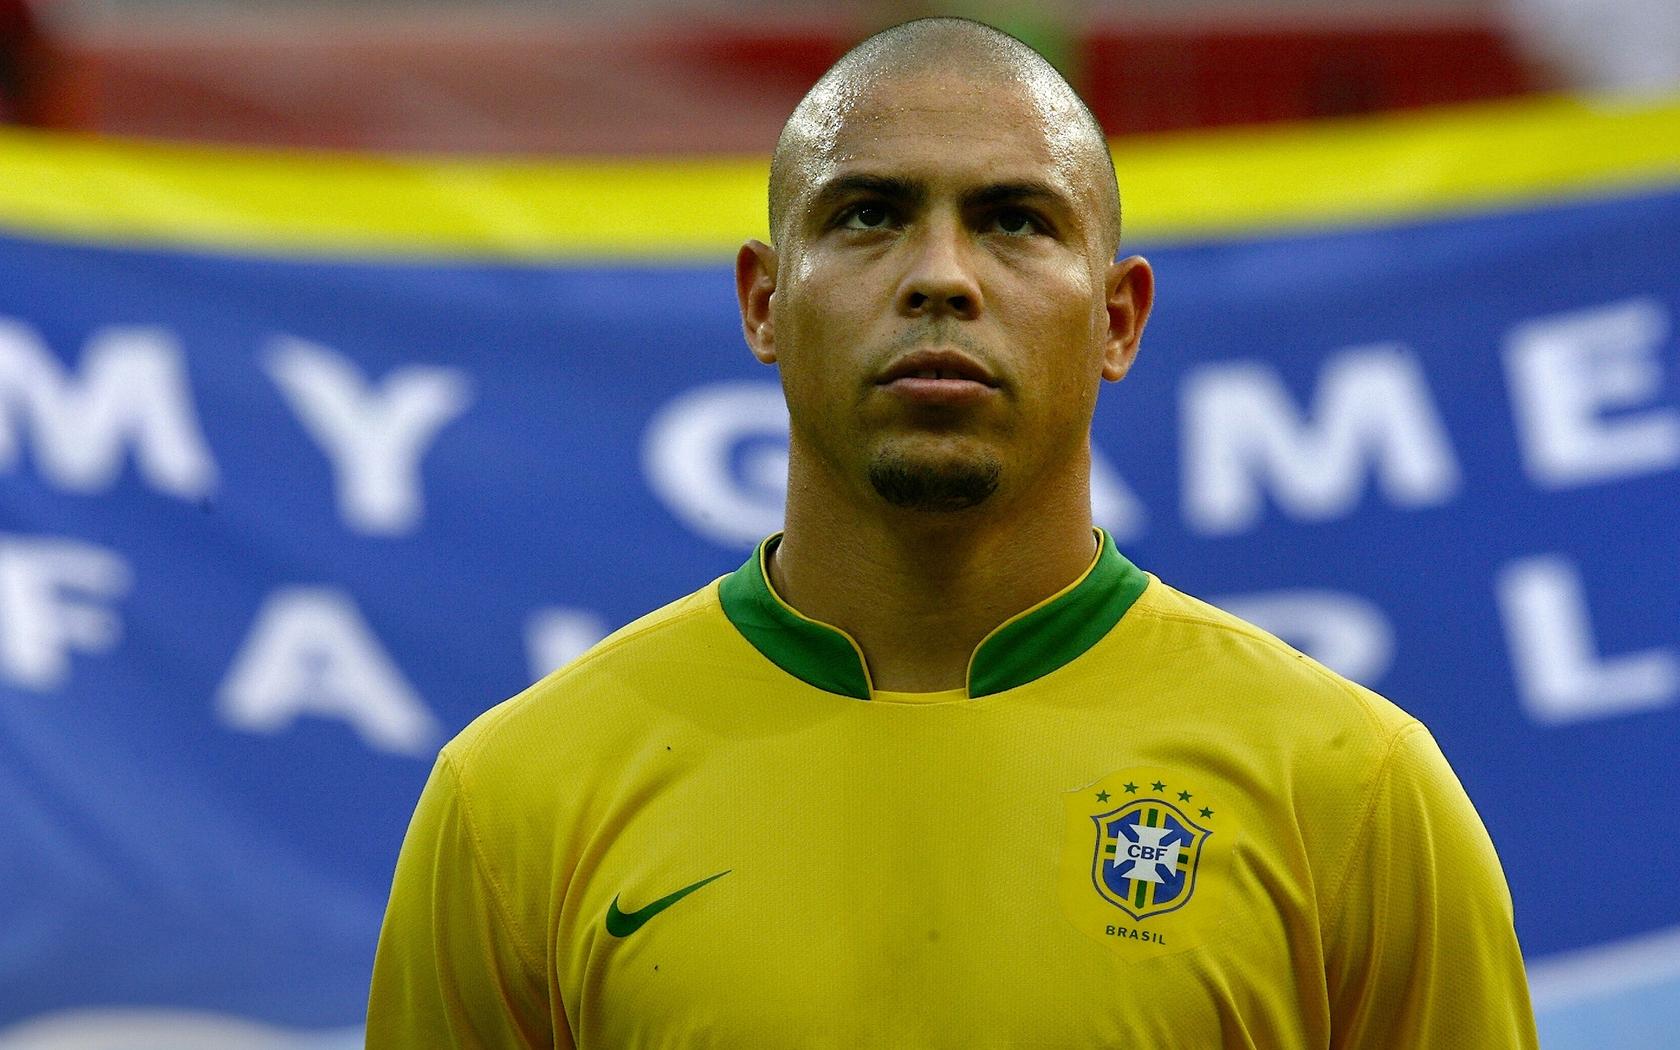 ronaldo-top-goal-scorers-1410062923